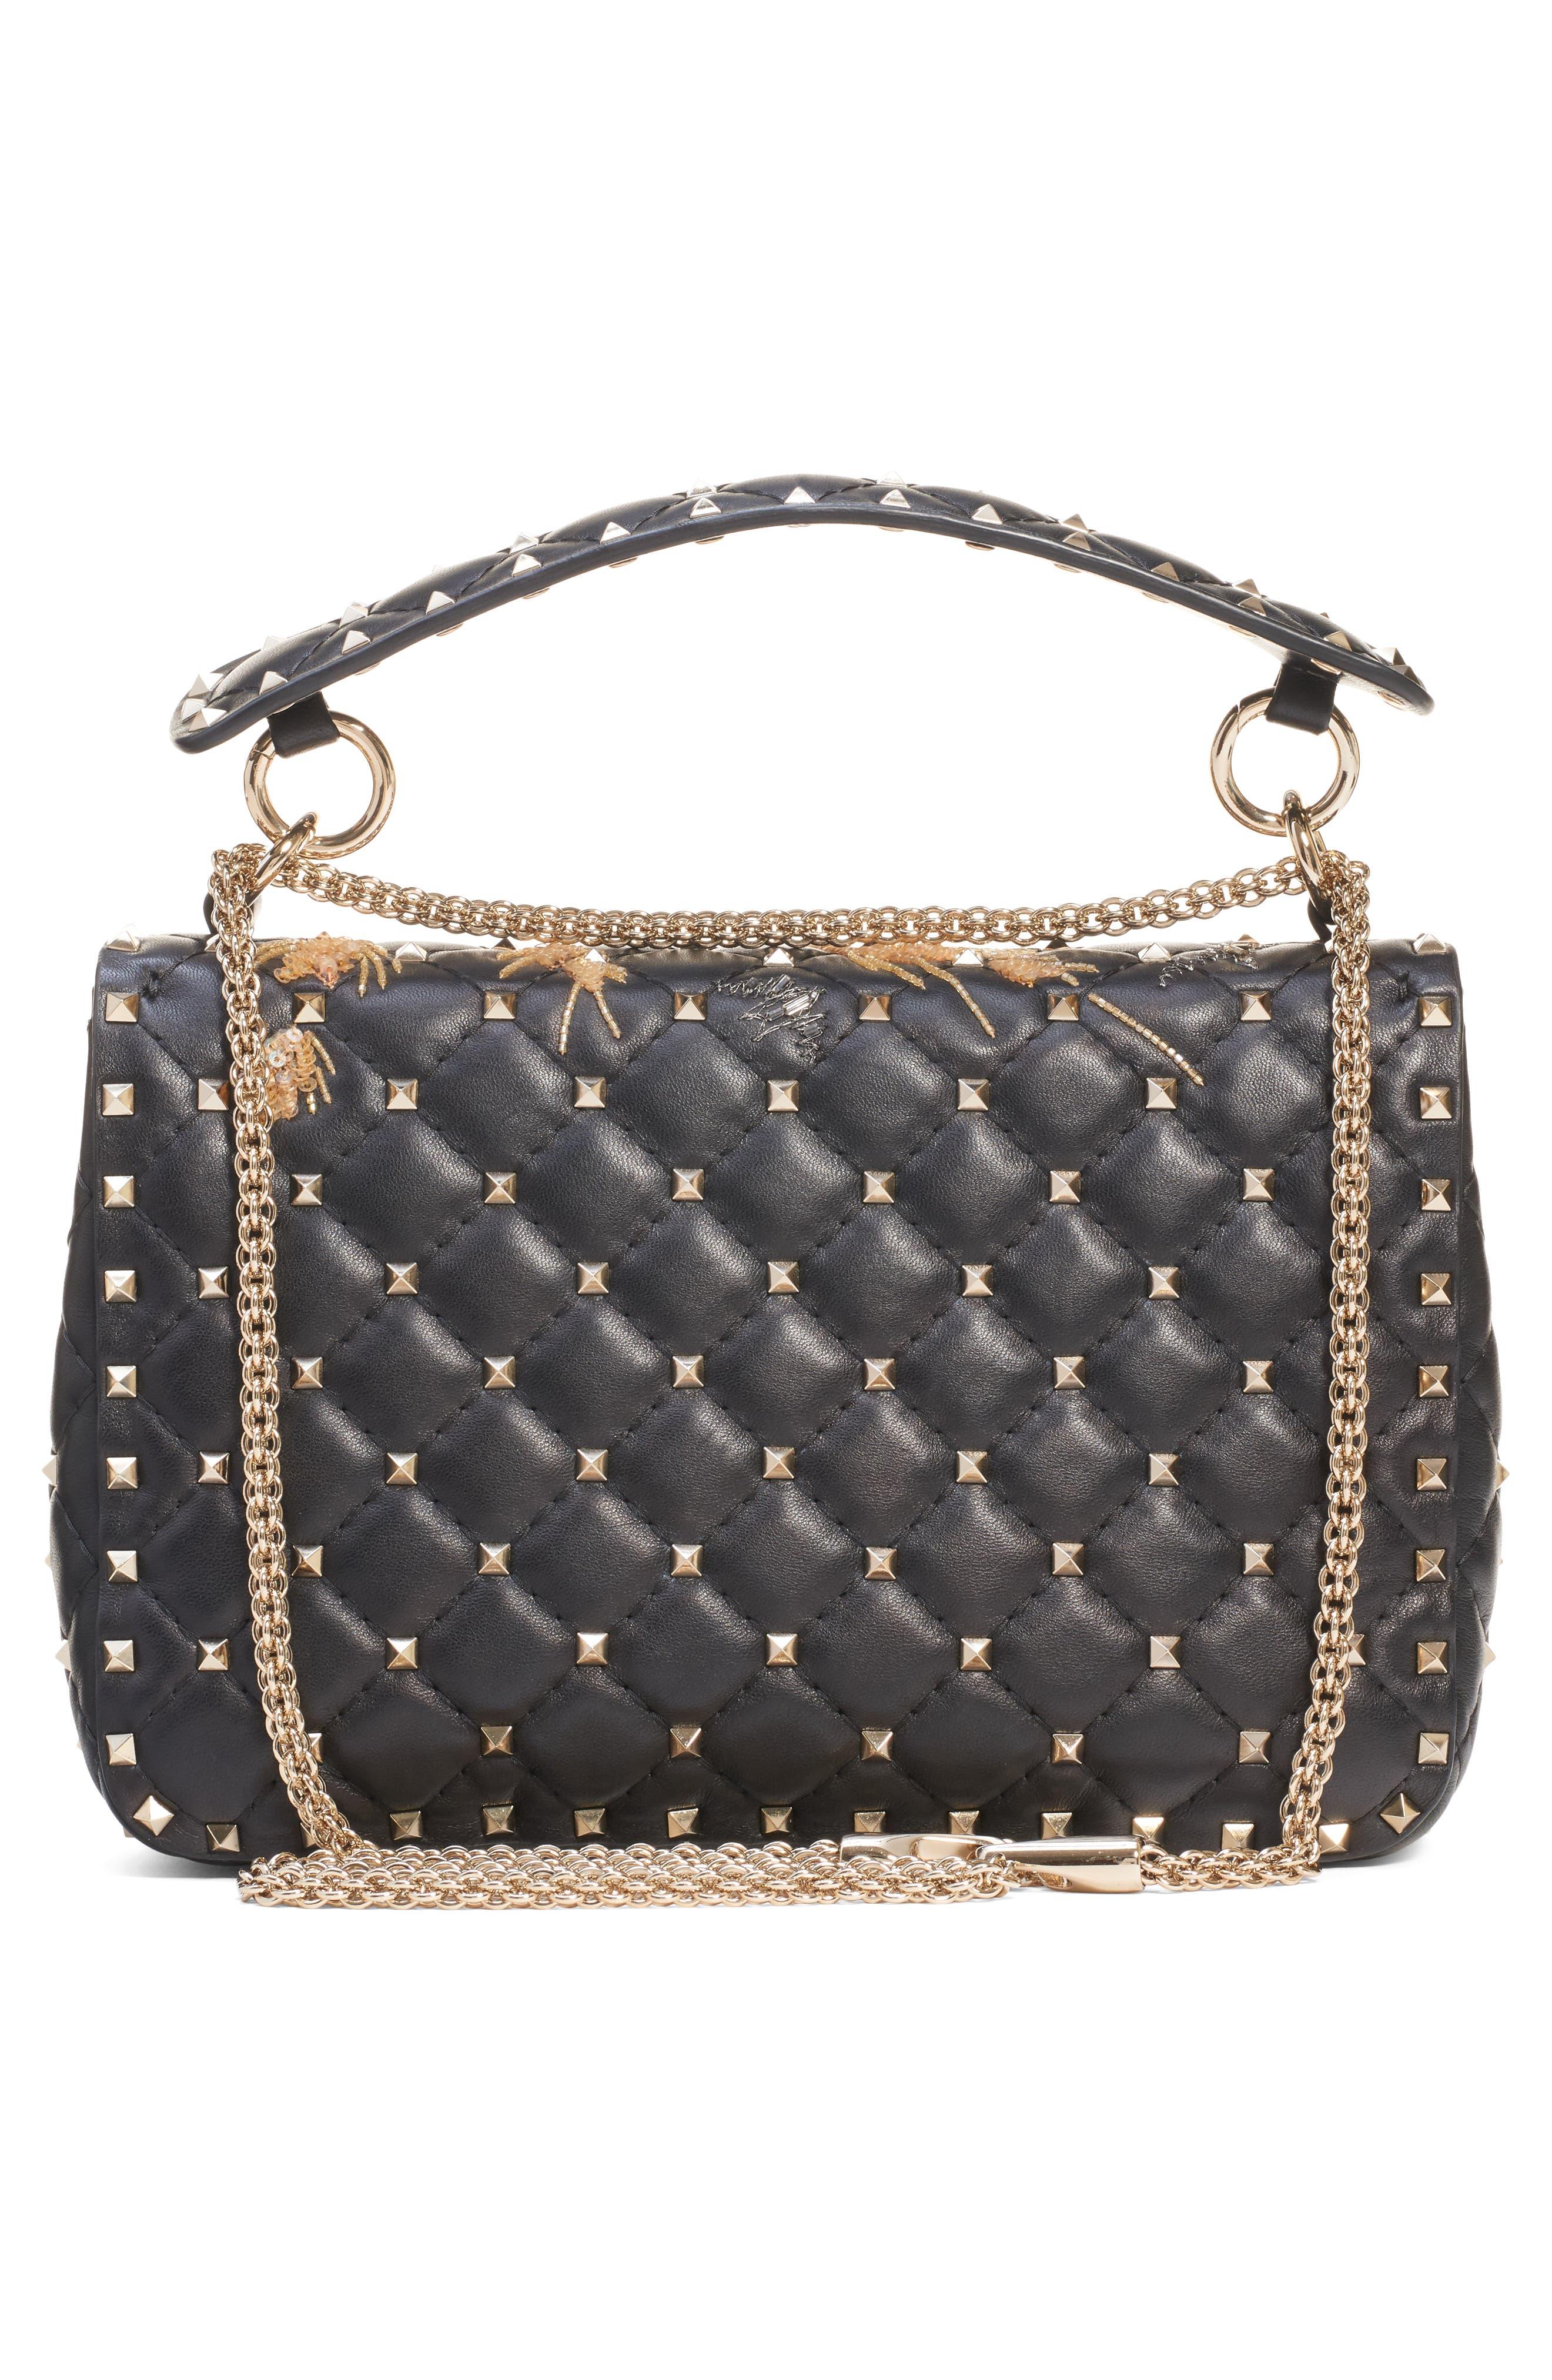 Medium Spike.It Beaded Leather Shoulder Bag,                             Alternate thumbnail 3, color,                             NERO